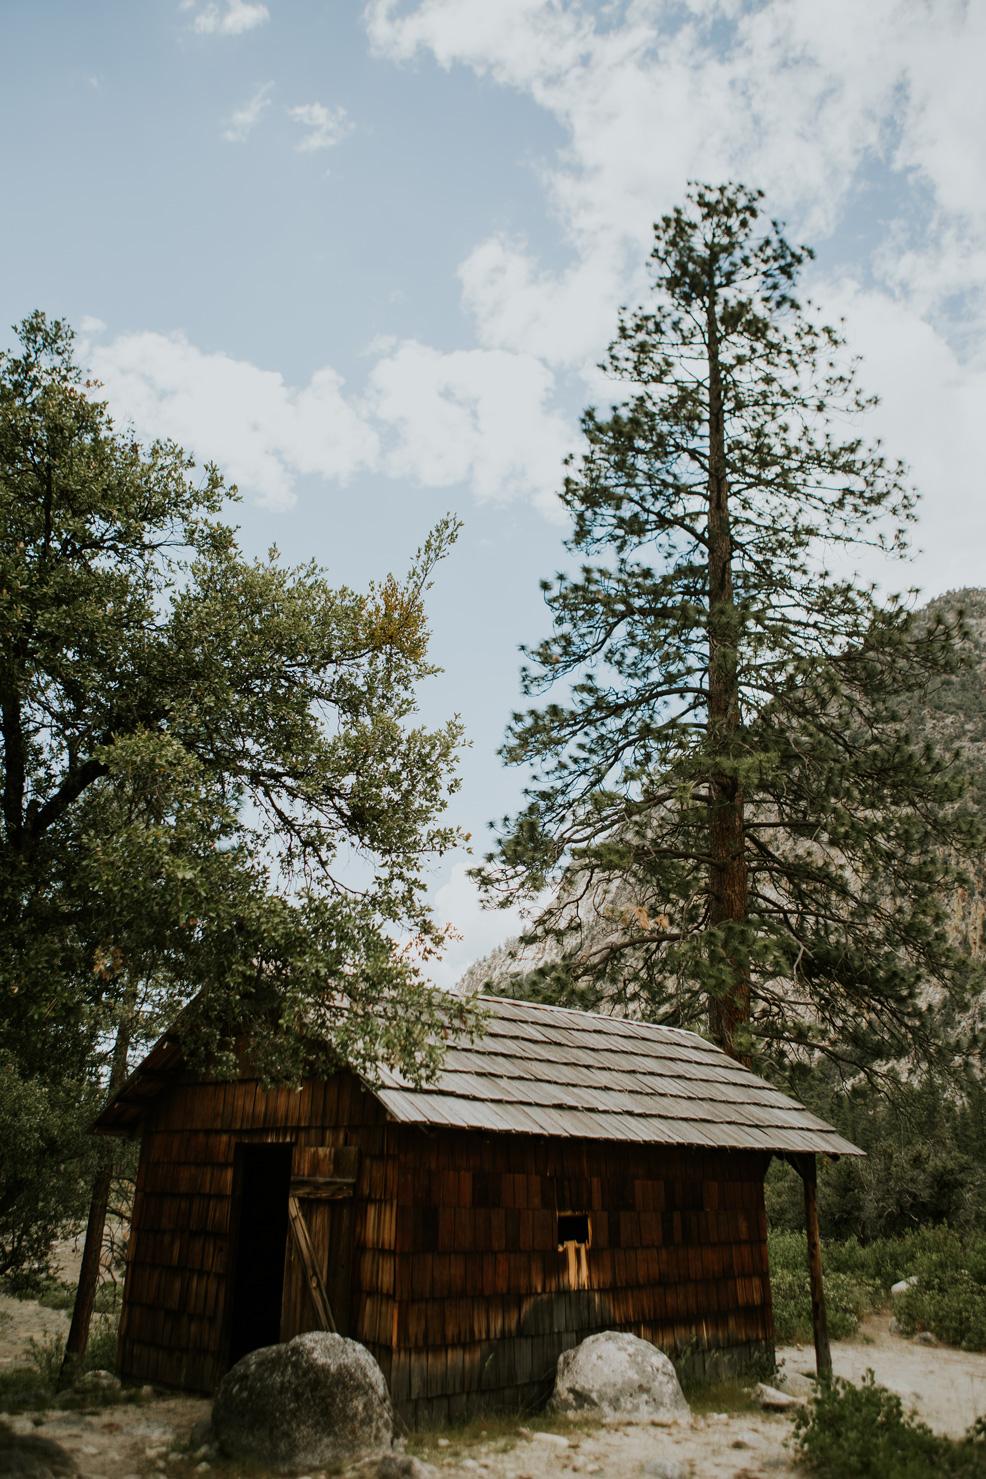 CindyGiovagnoli_Sequoia_KingsCanyon_National_Park_California_forest_fire-021.jpg